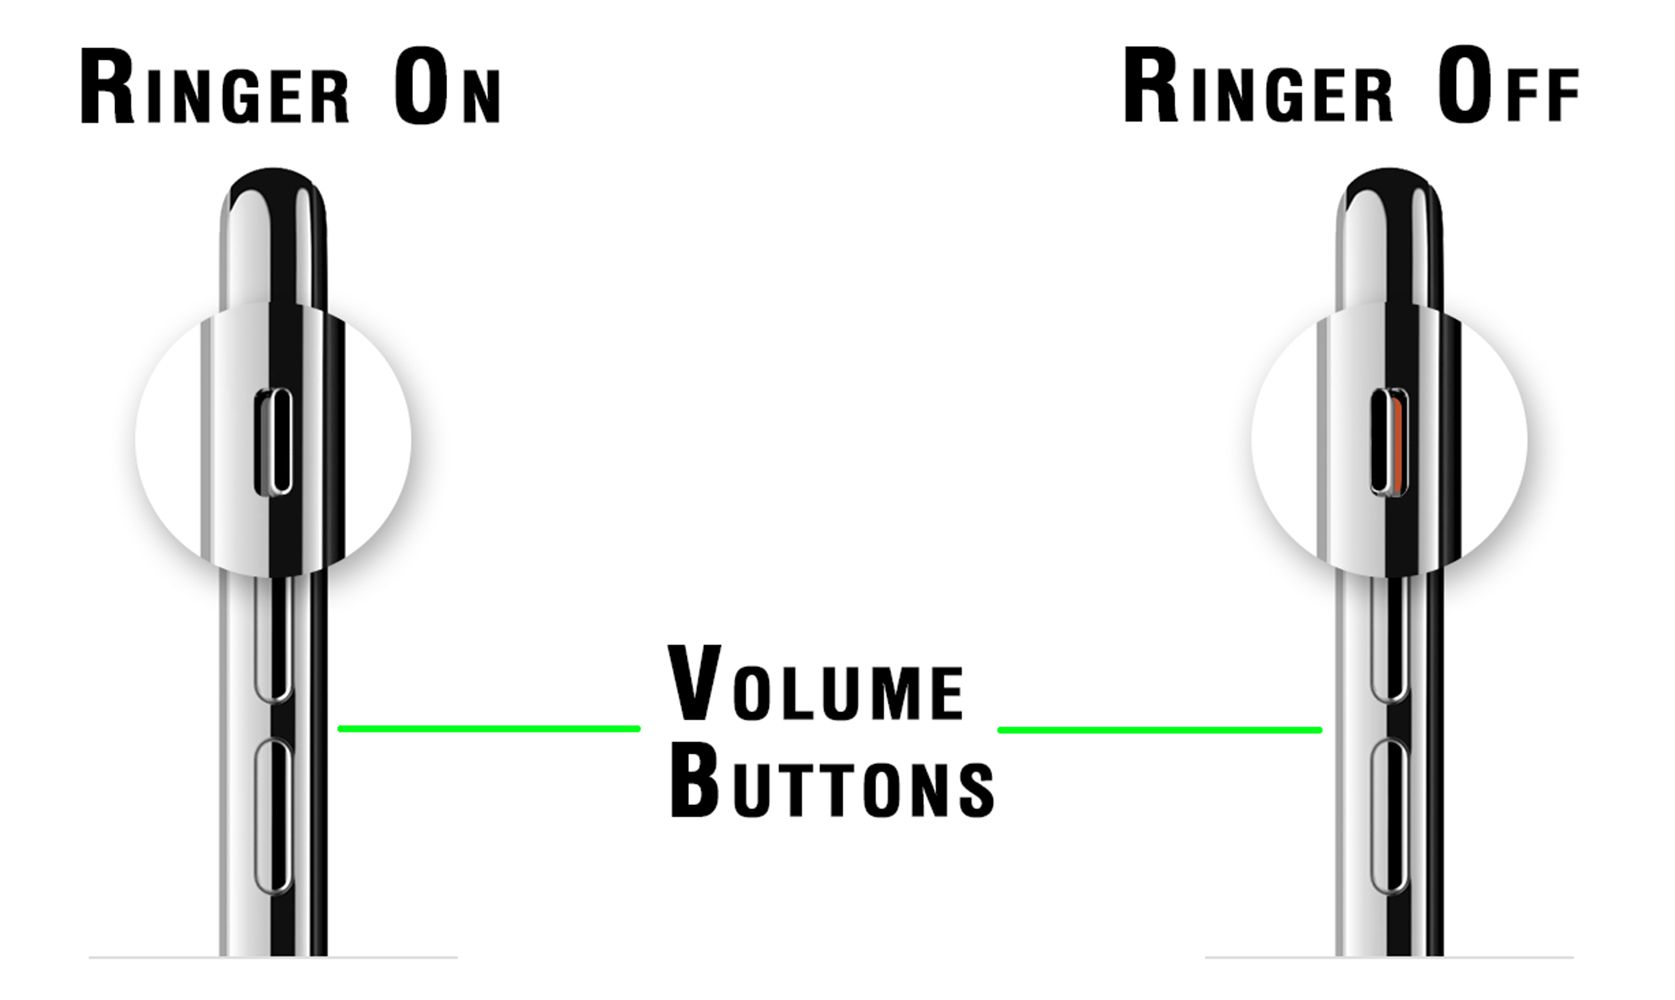 no ringer volume iphone 5